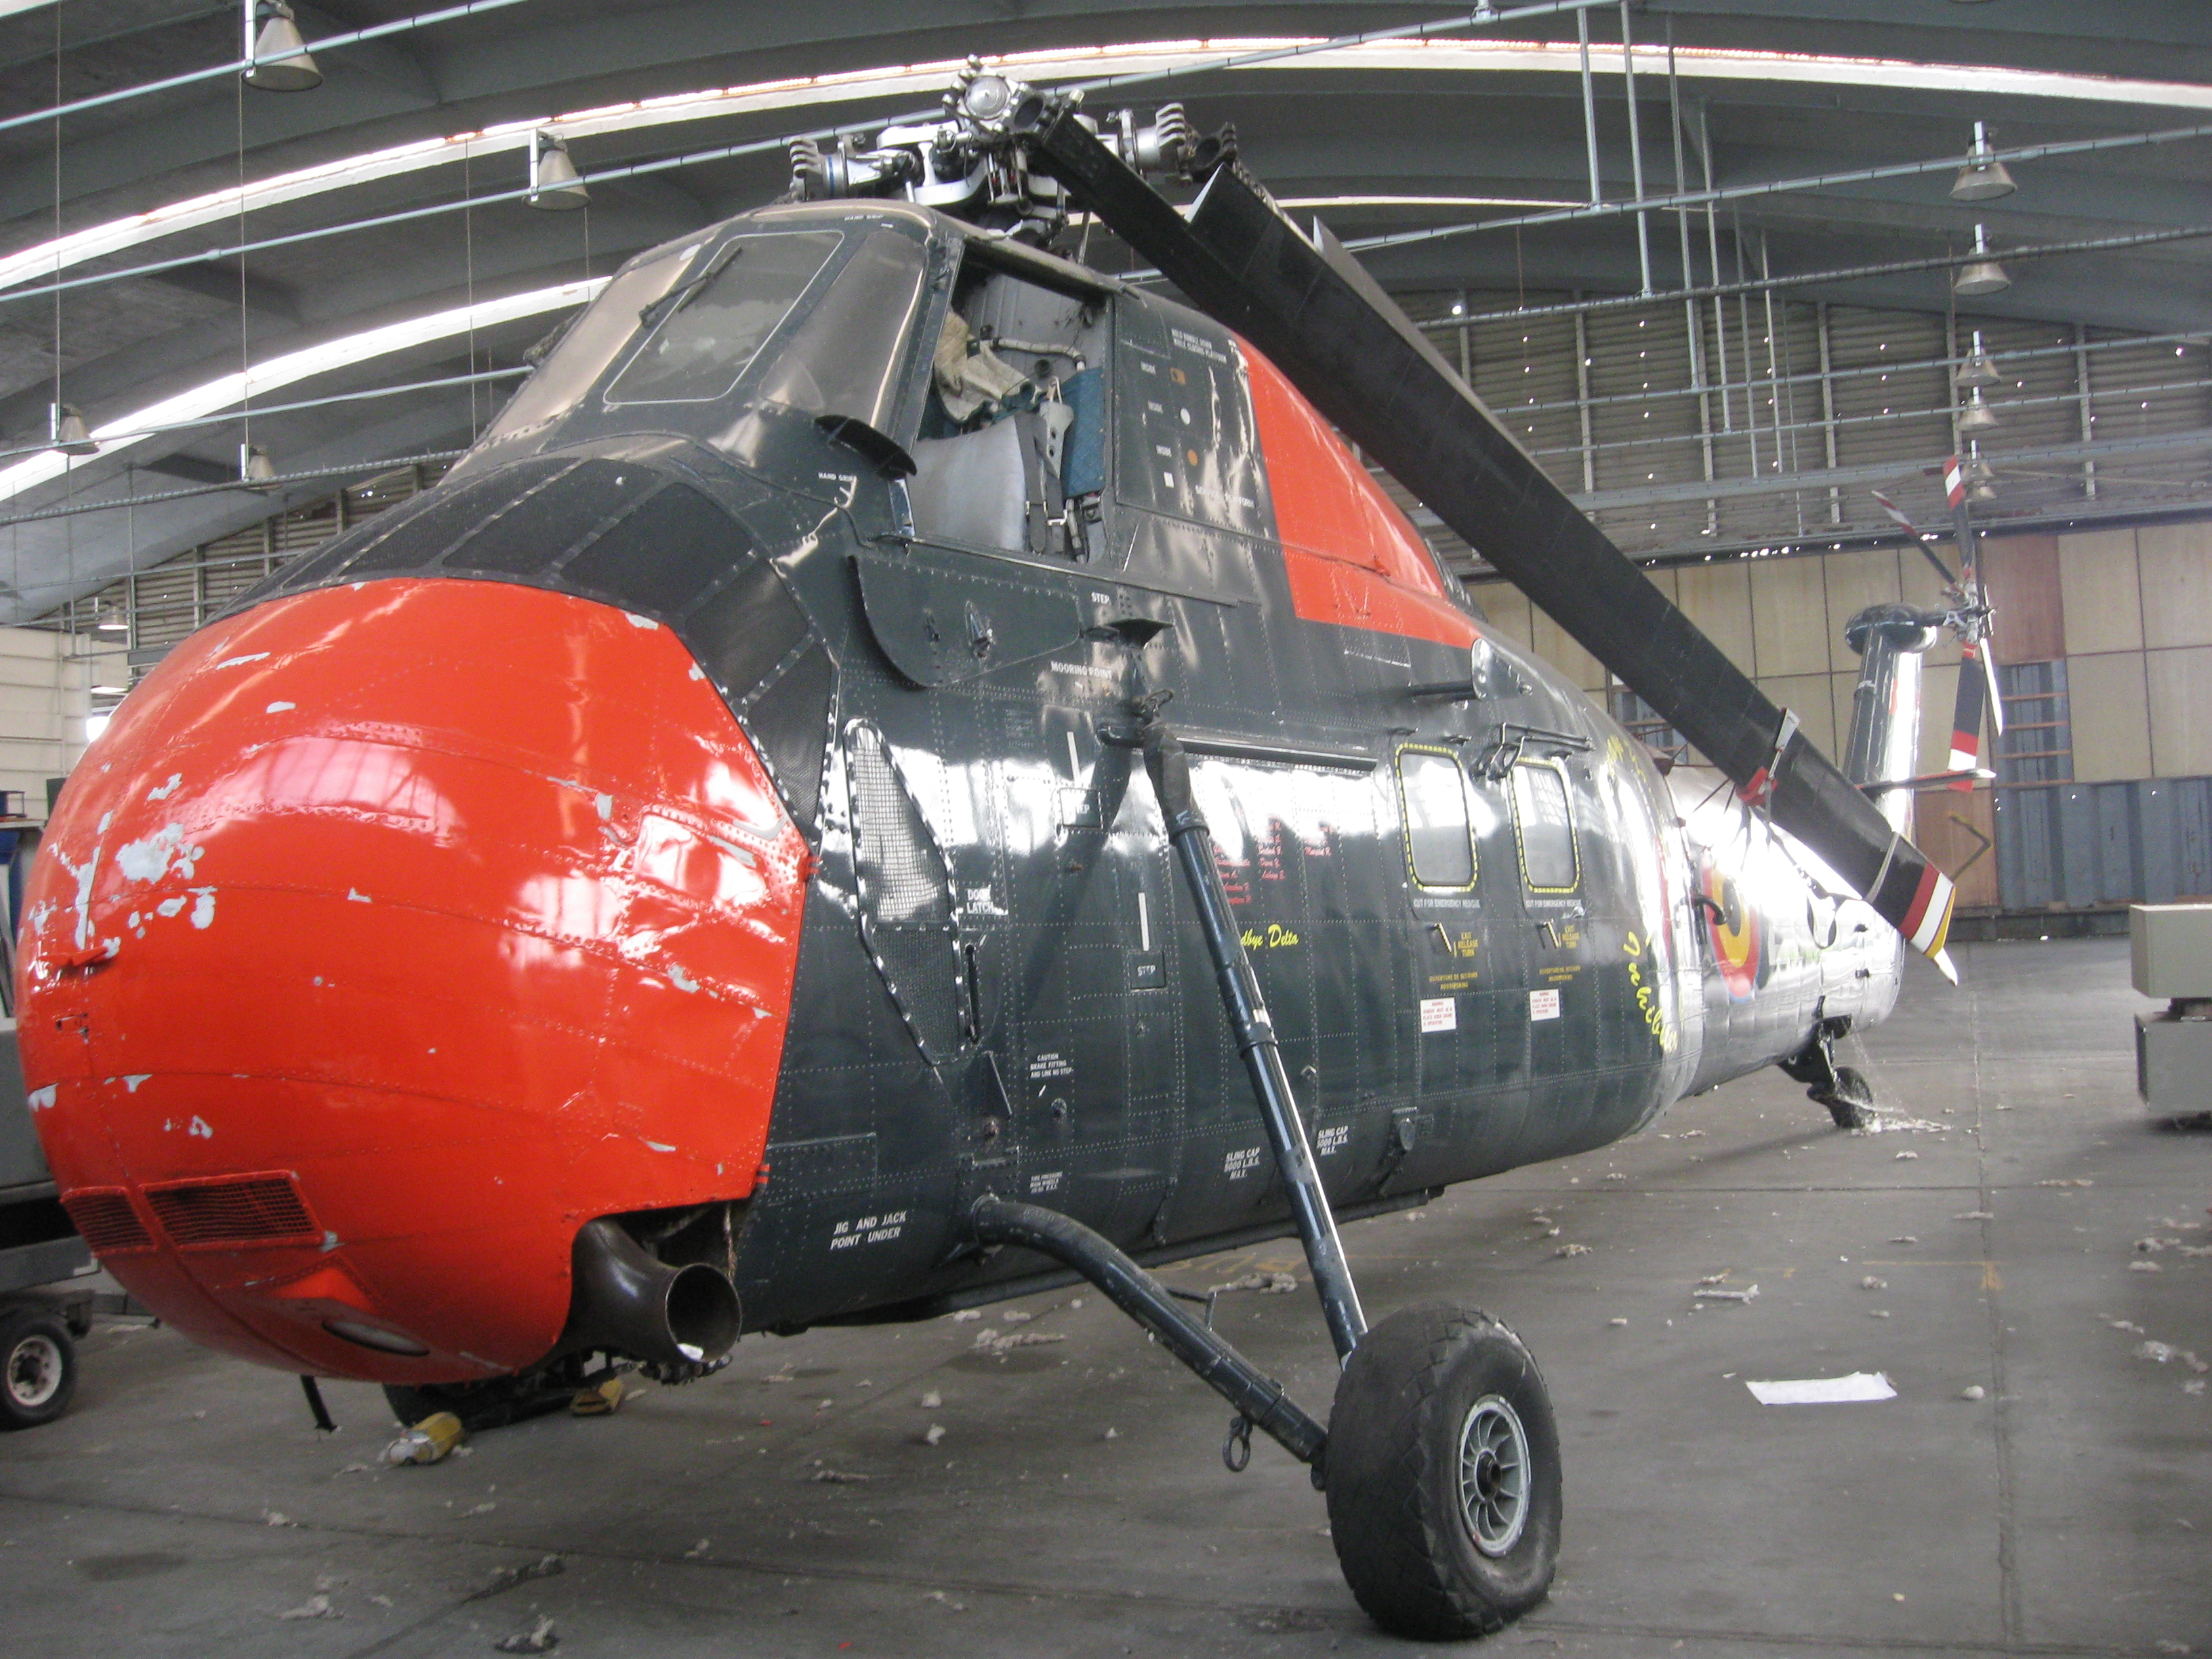 Sikorsky H-34 1008190742471050246592443